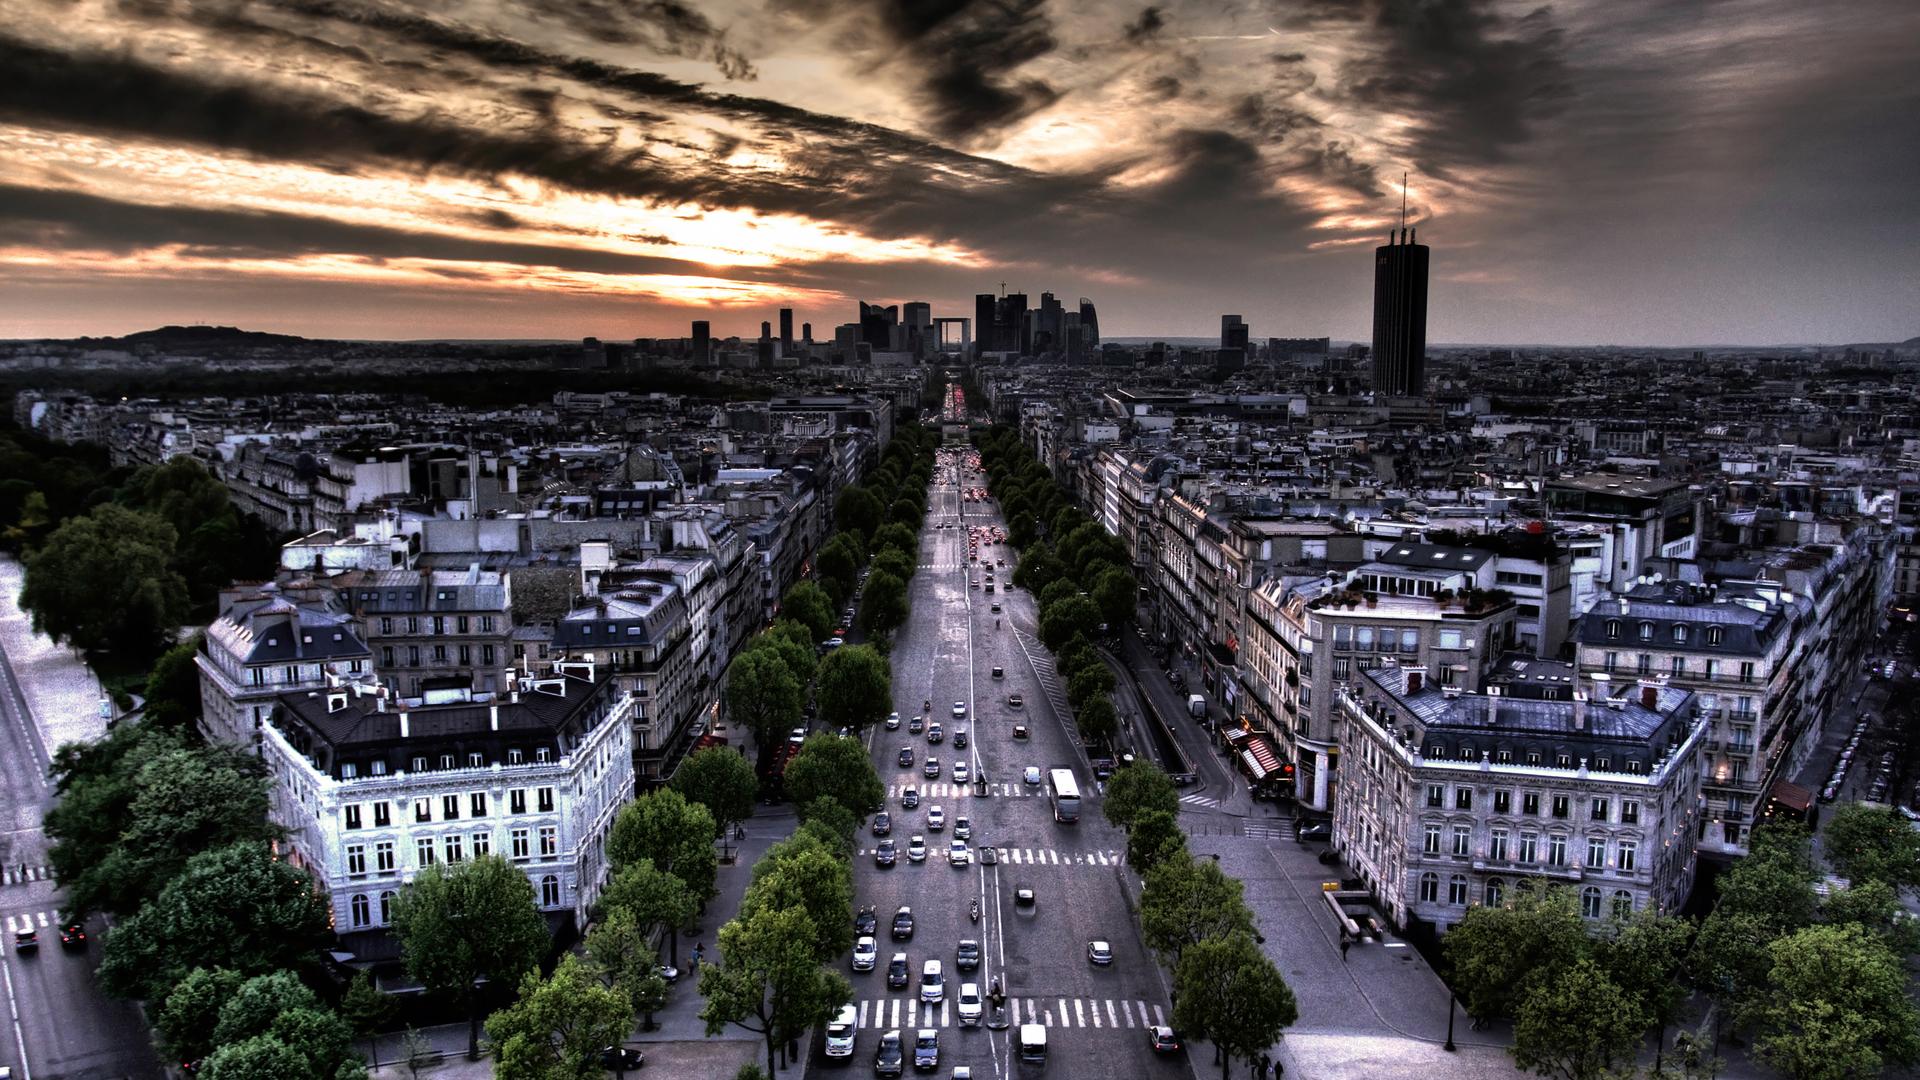 amazing cityscape photography wallpaper HD europe